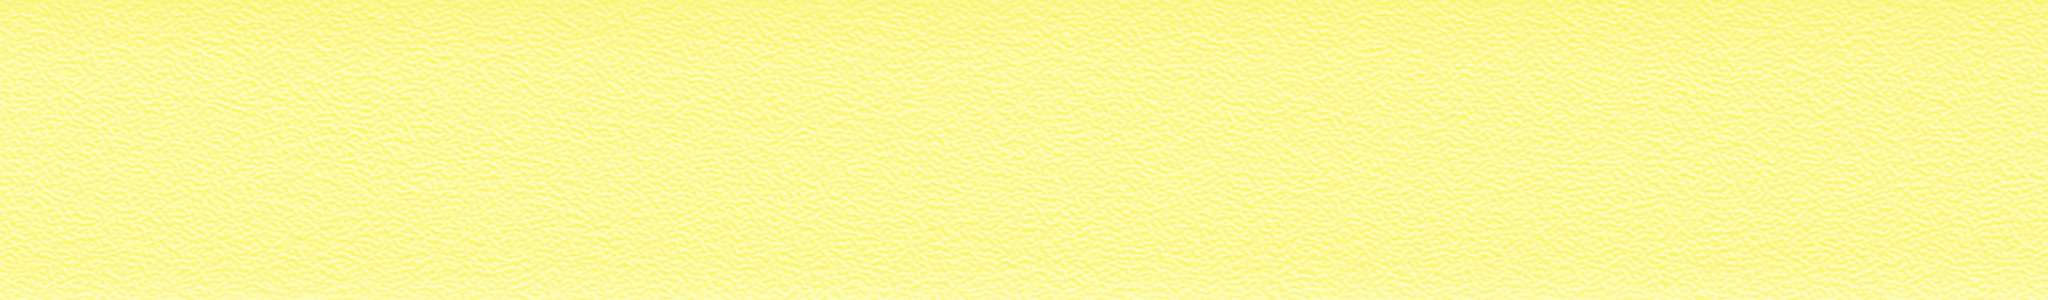 HU 110669 ABS hrana žlutá brazil perla 101